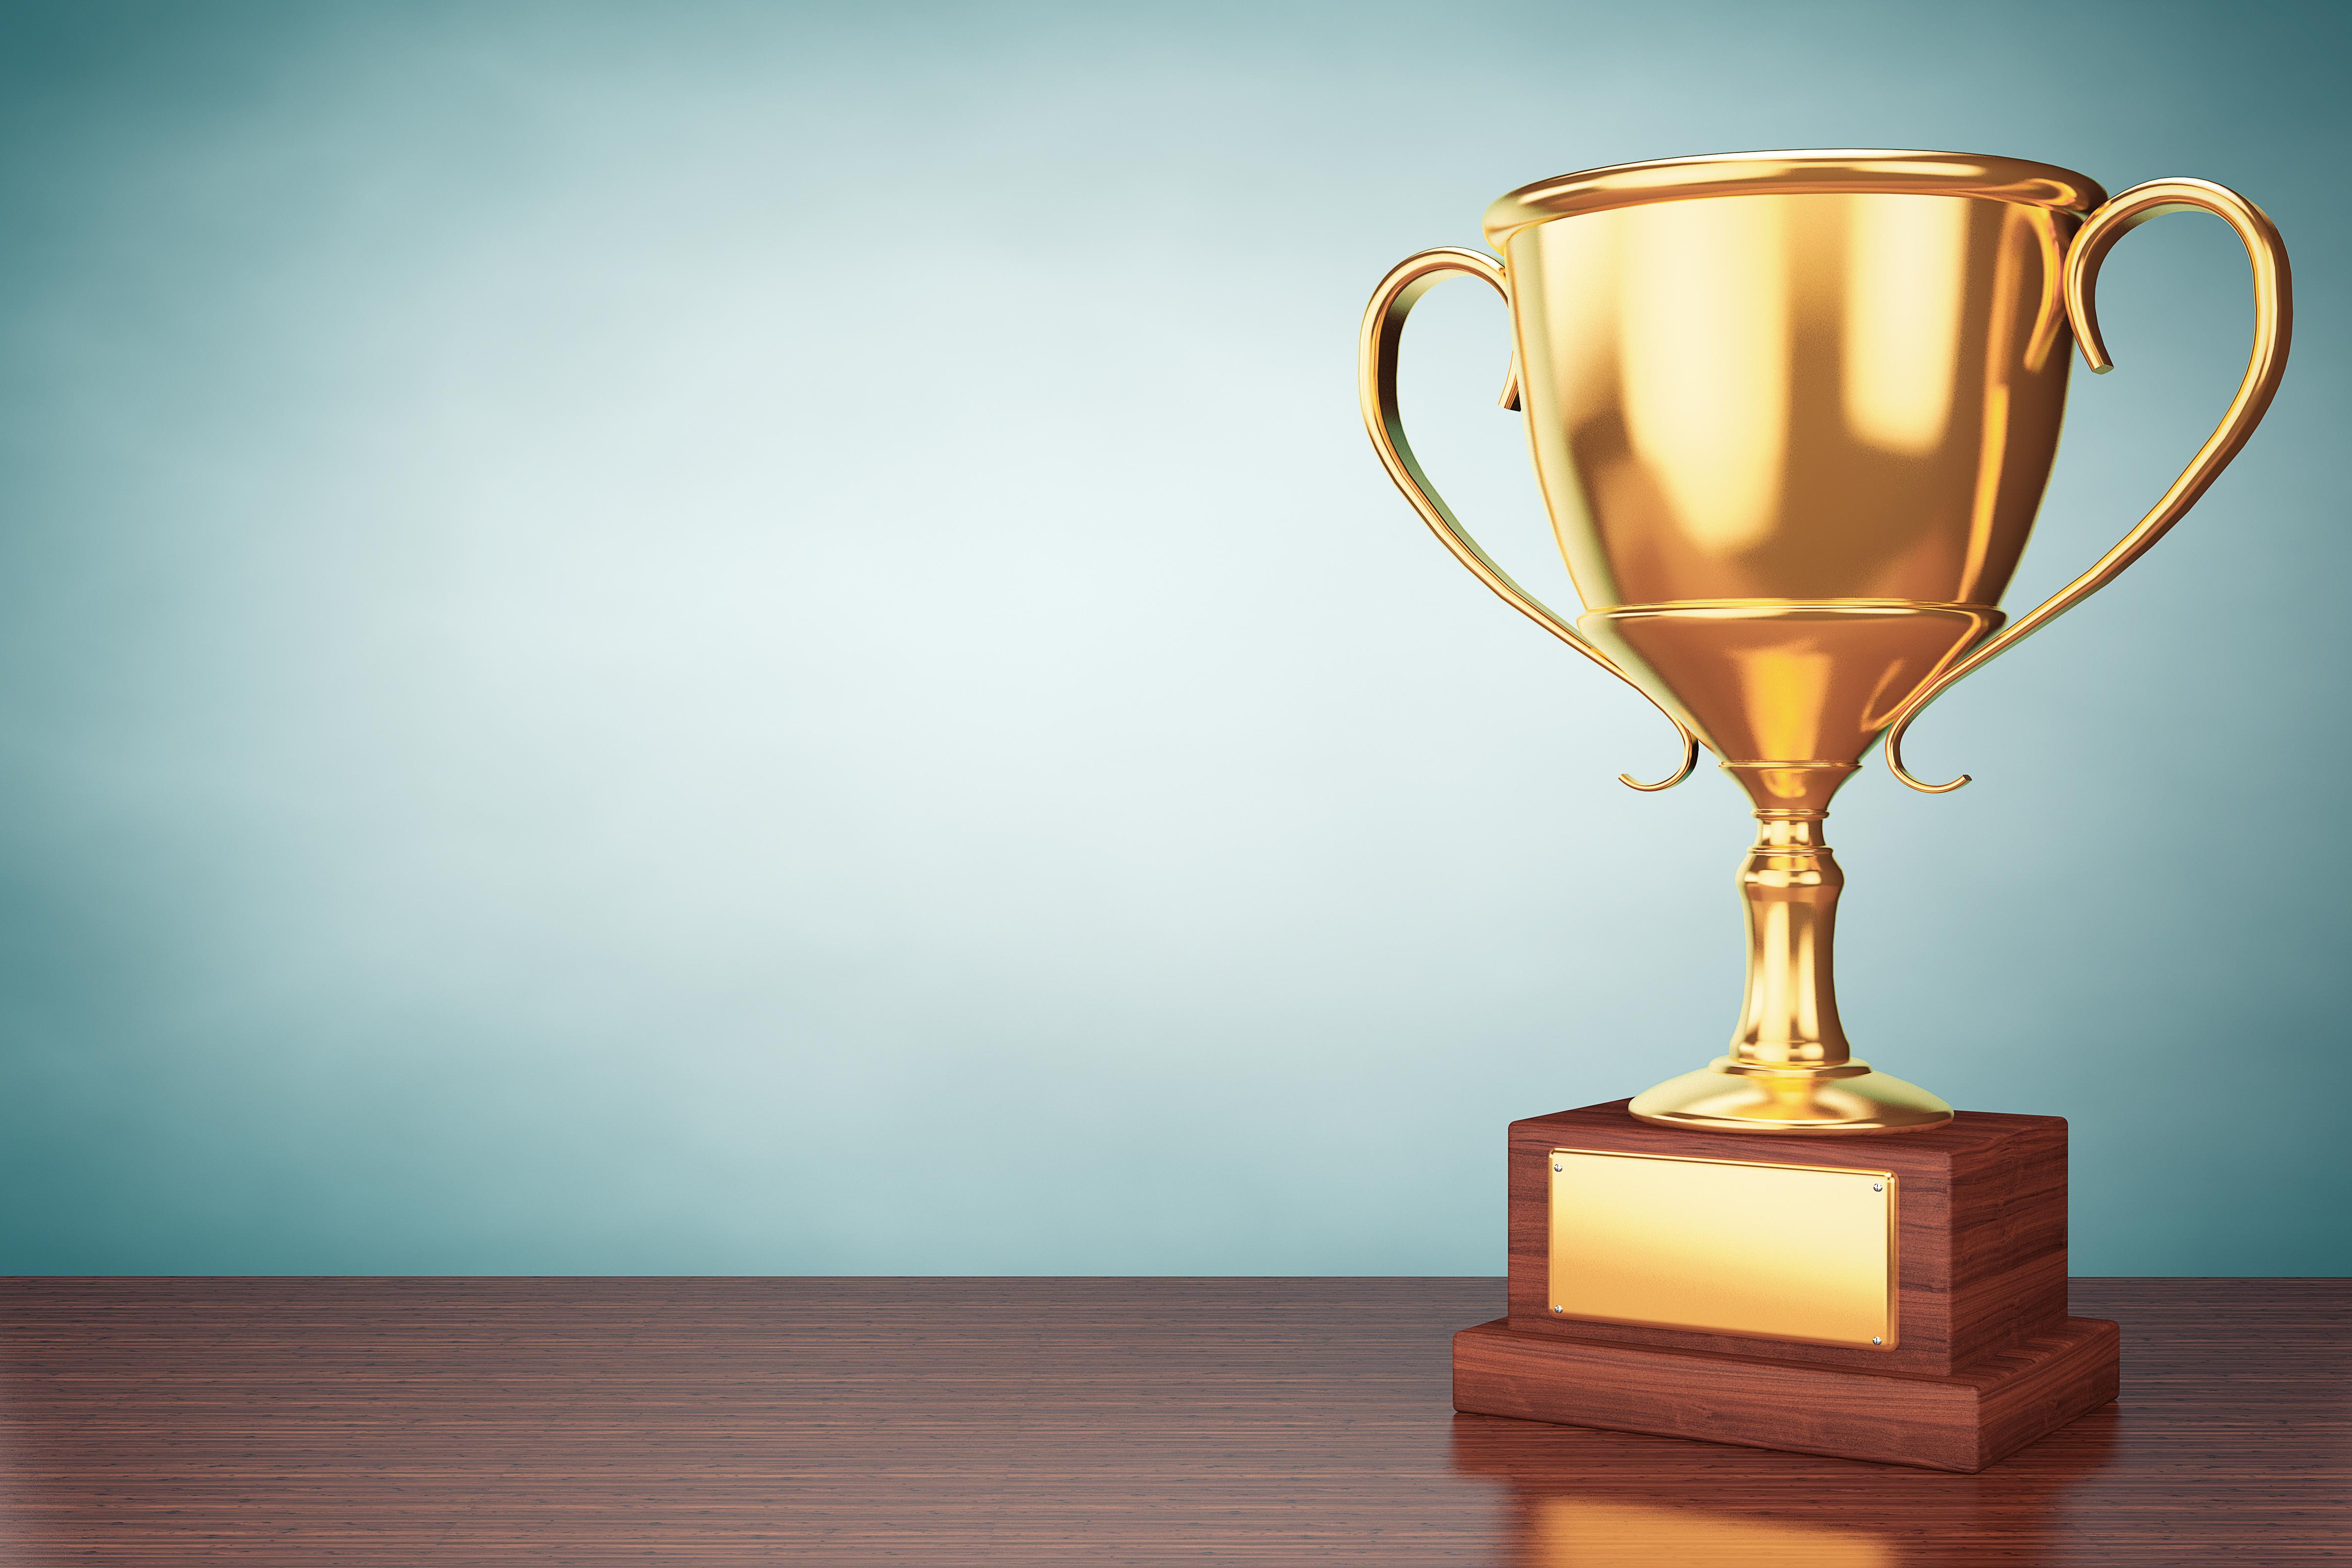 A trophy.